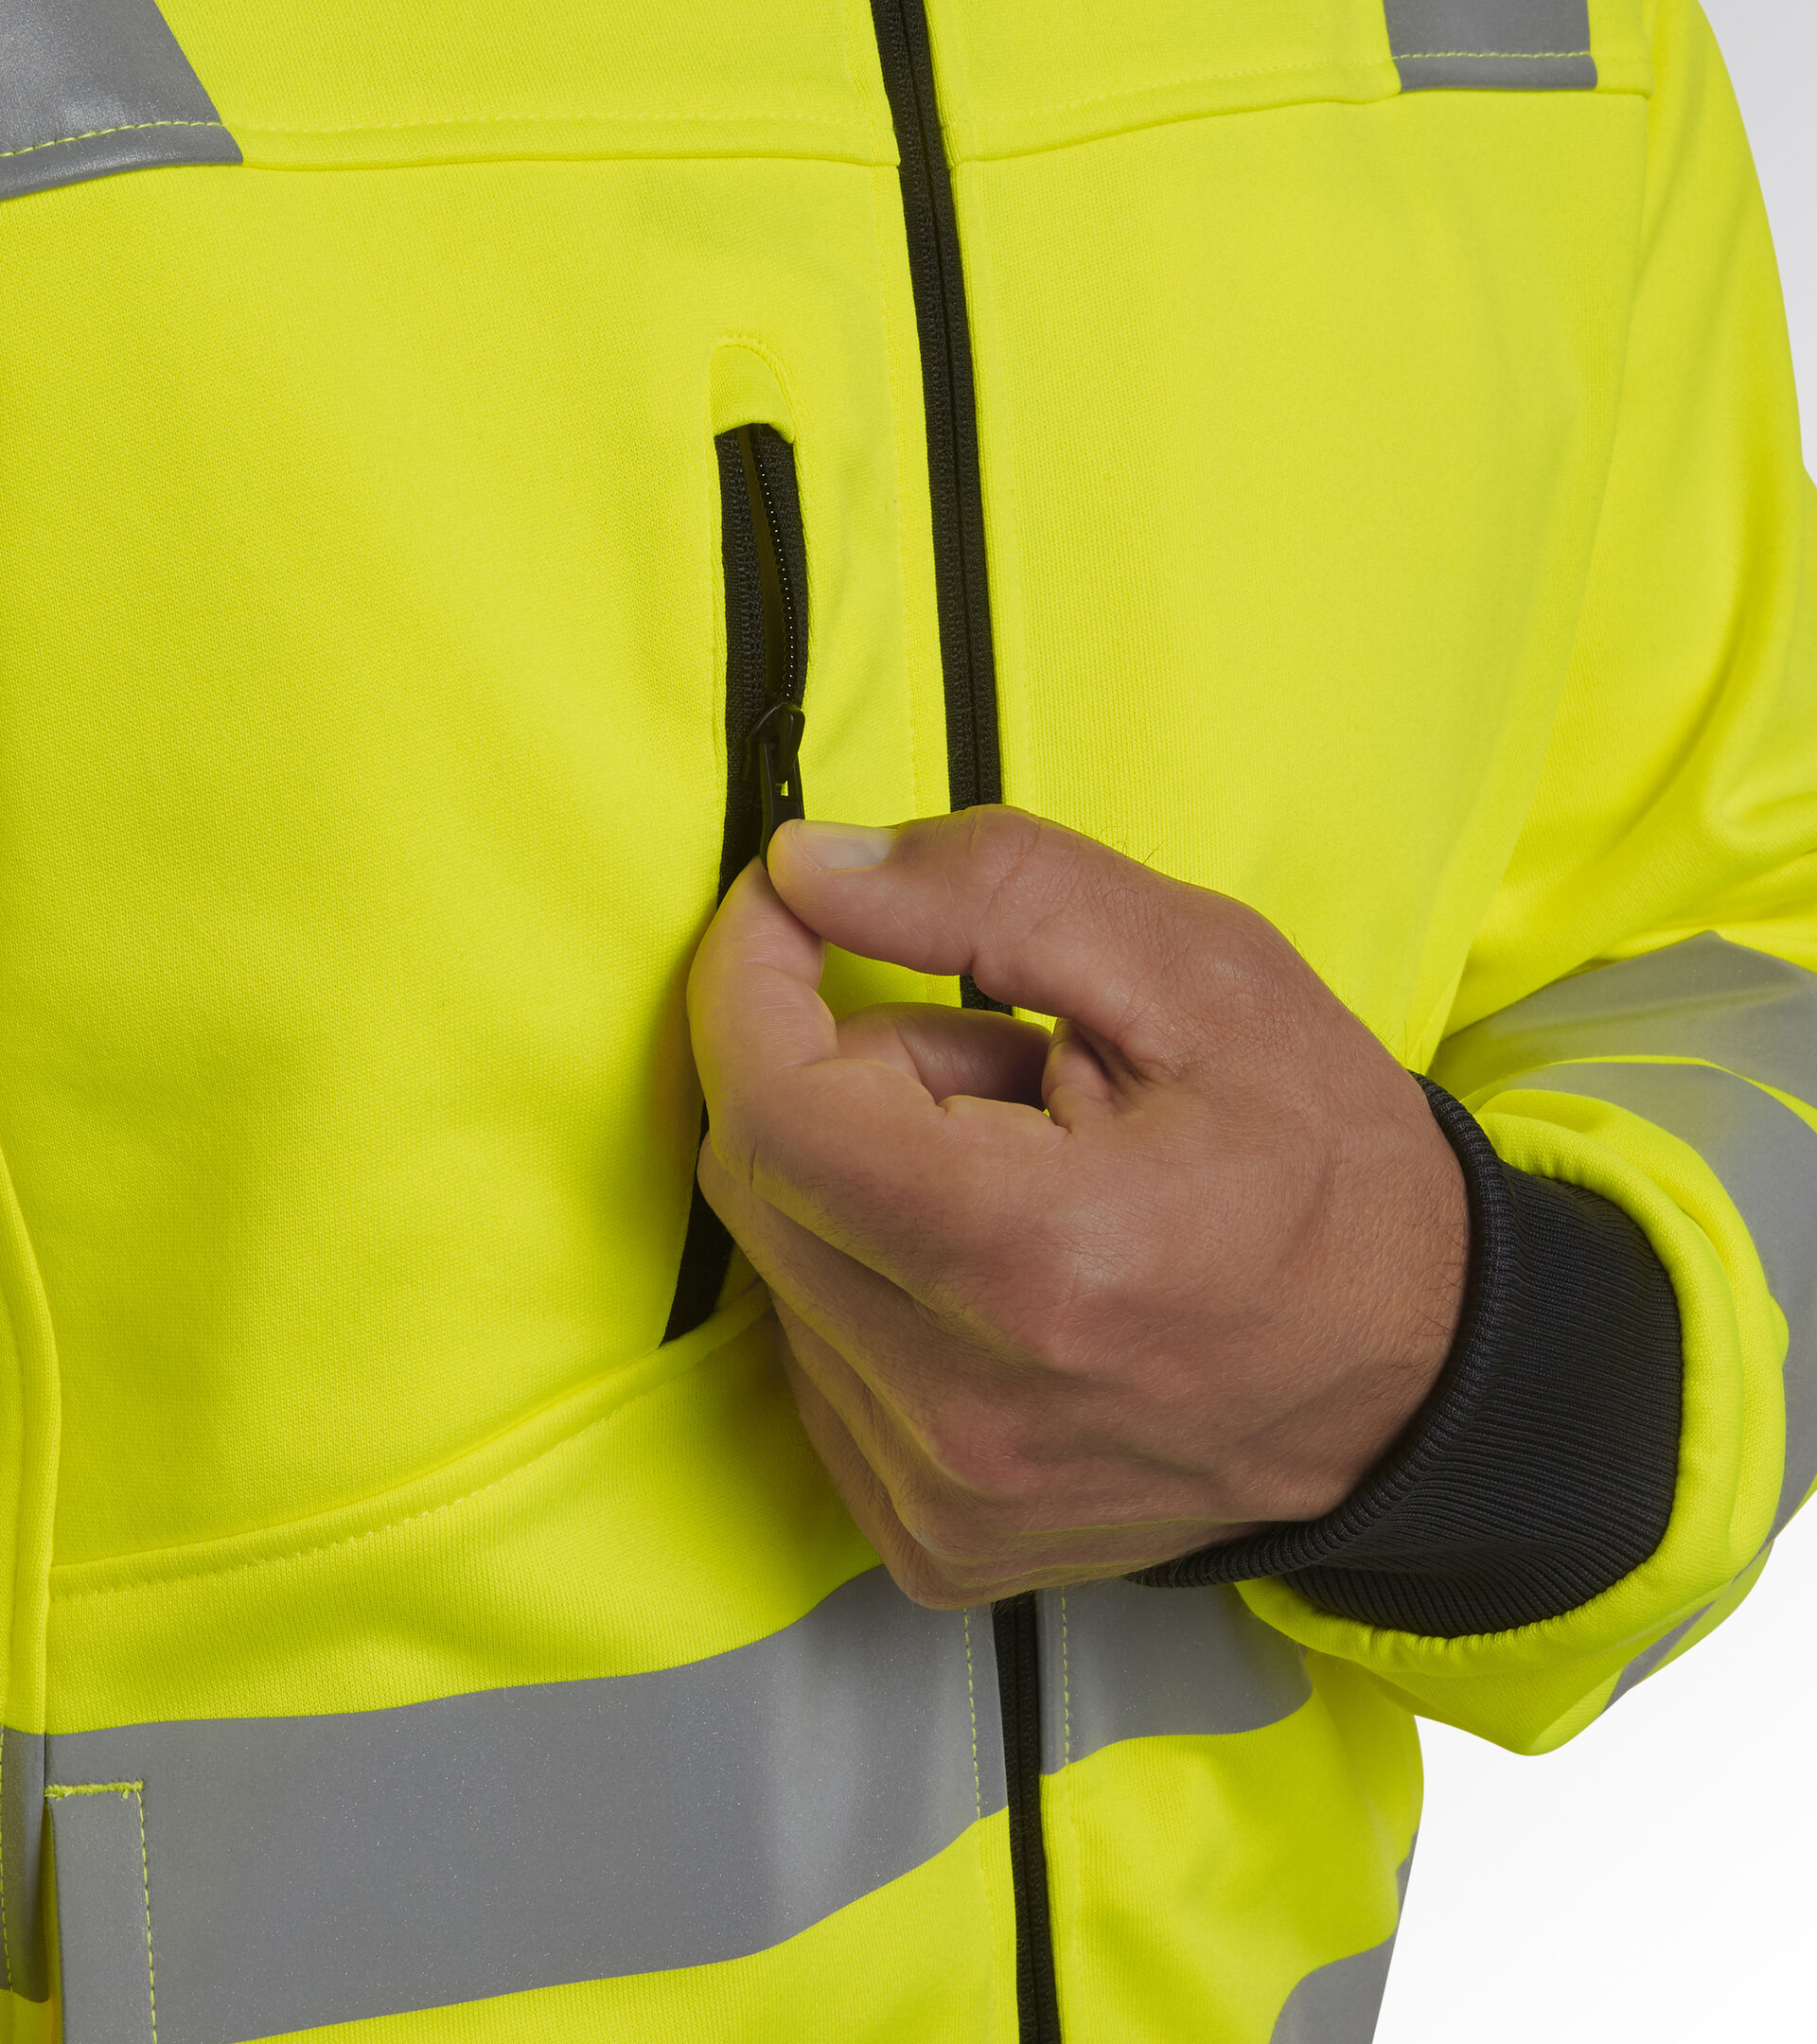 Apparel Utility UOMO HOODIE FZ HV 20471:2013 2 FLUORESCENT YELLOW ISO20471 Utility